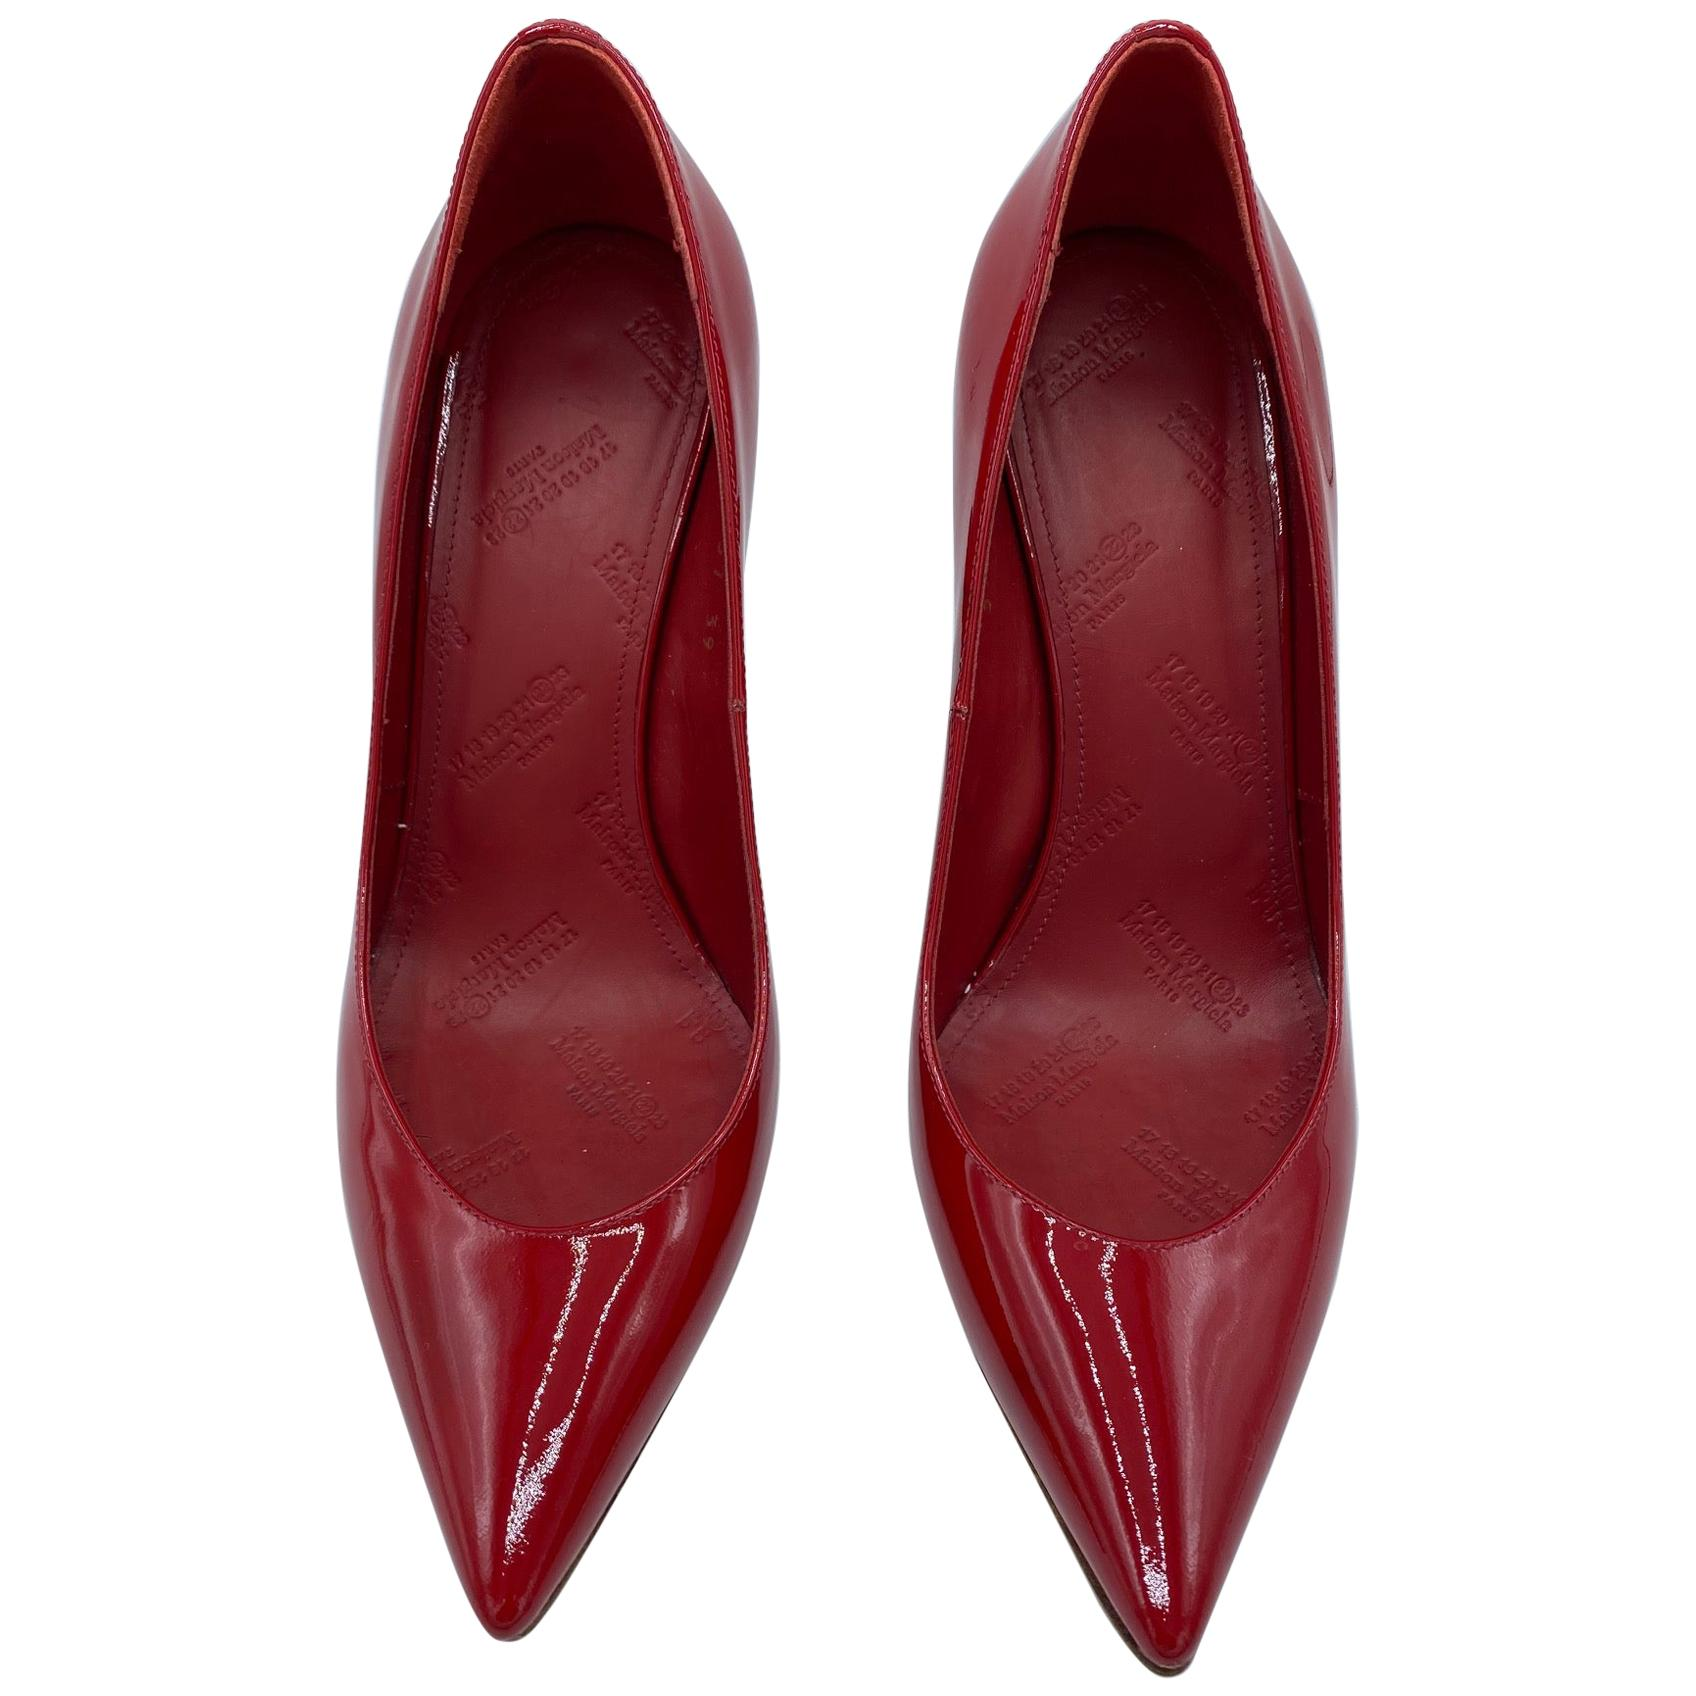 Maison Margiela Red Patent Leather Pump Heels Size 38